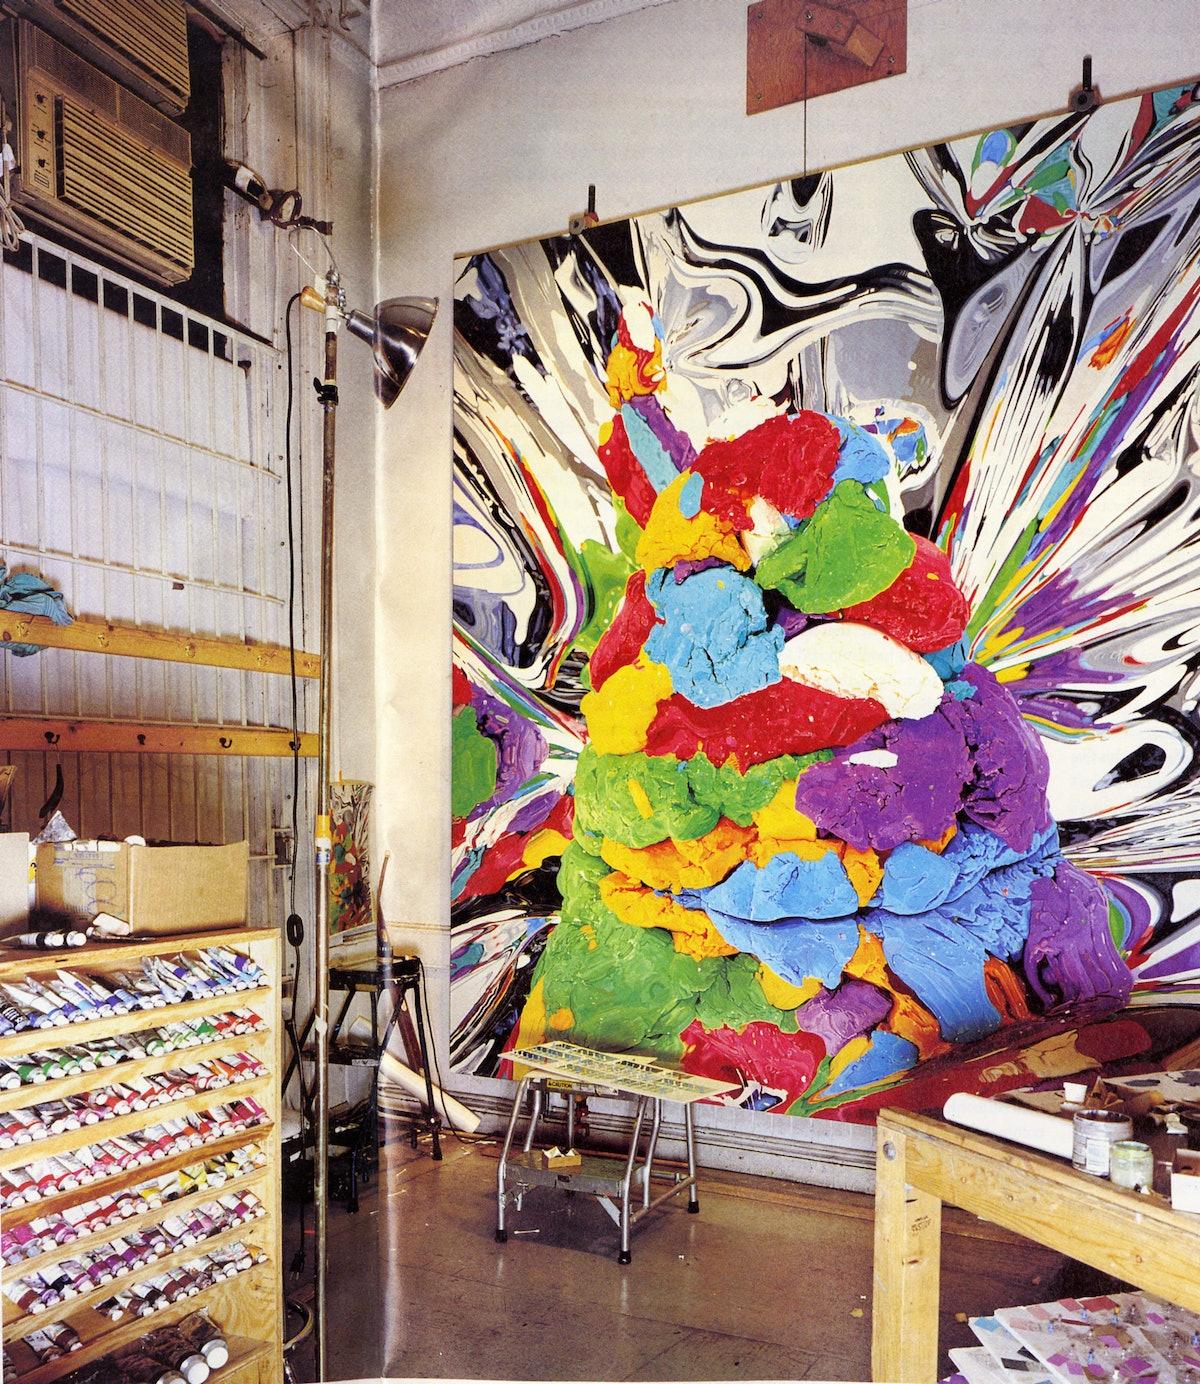 visiting-artists-01-jeff-koons